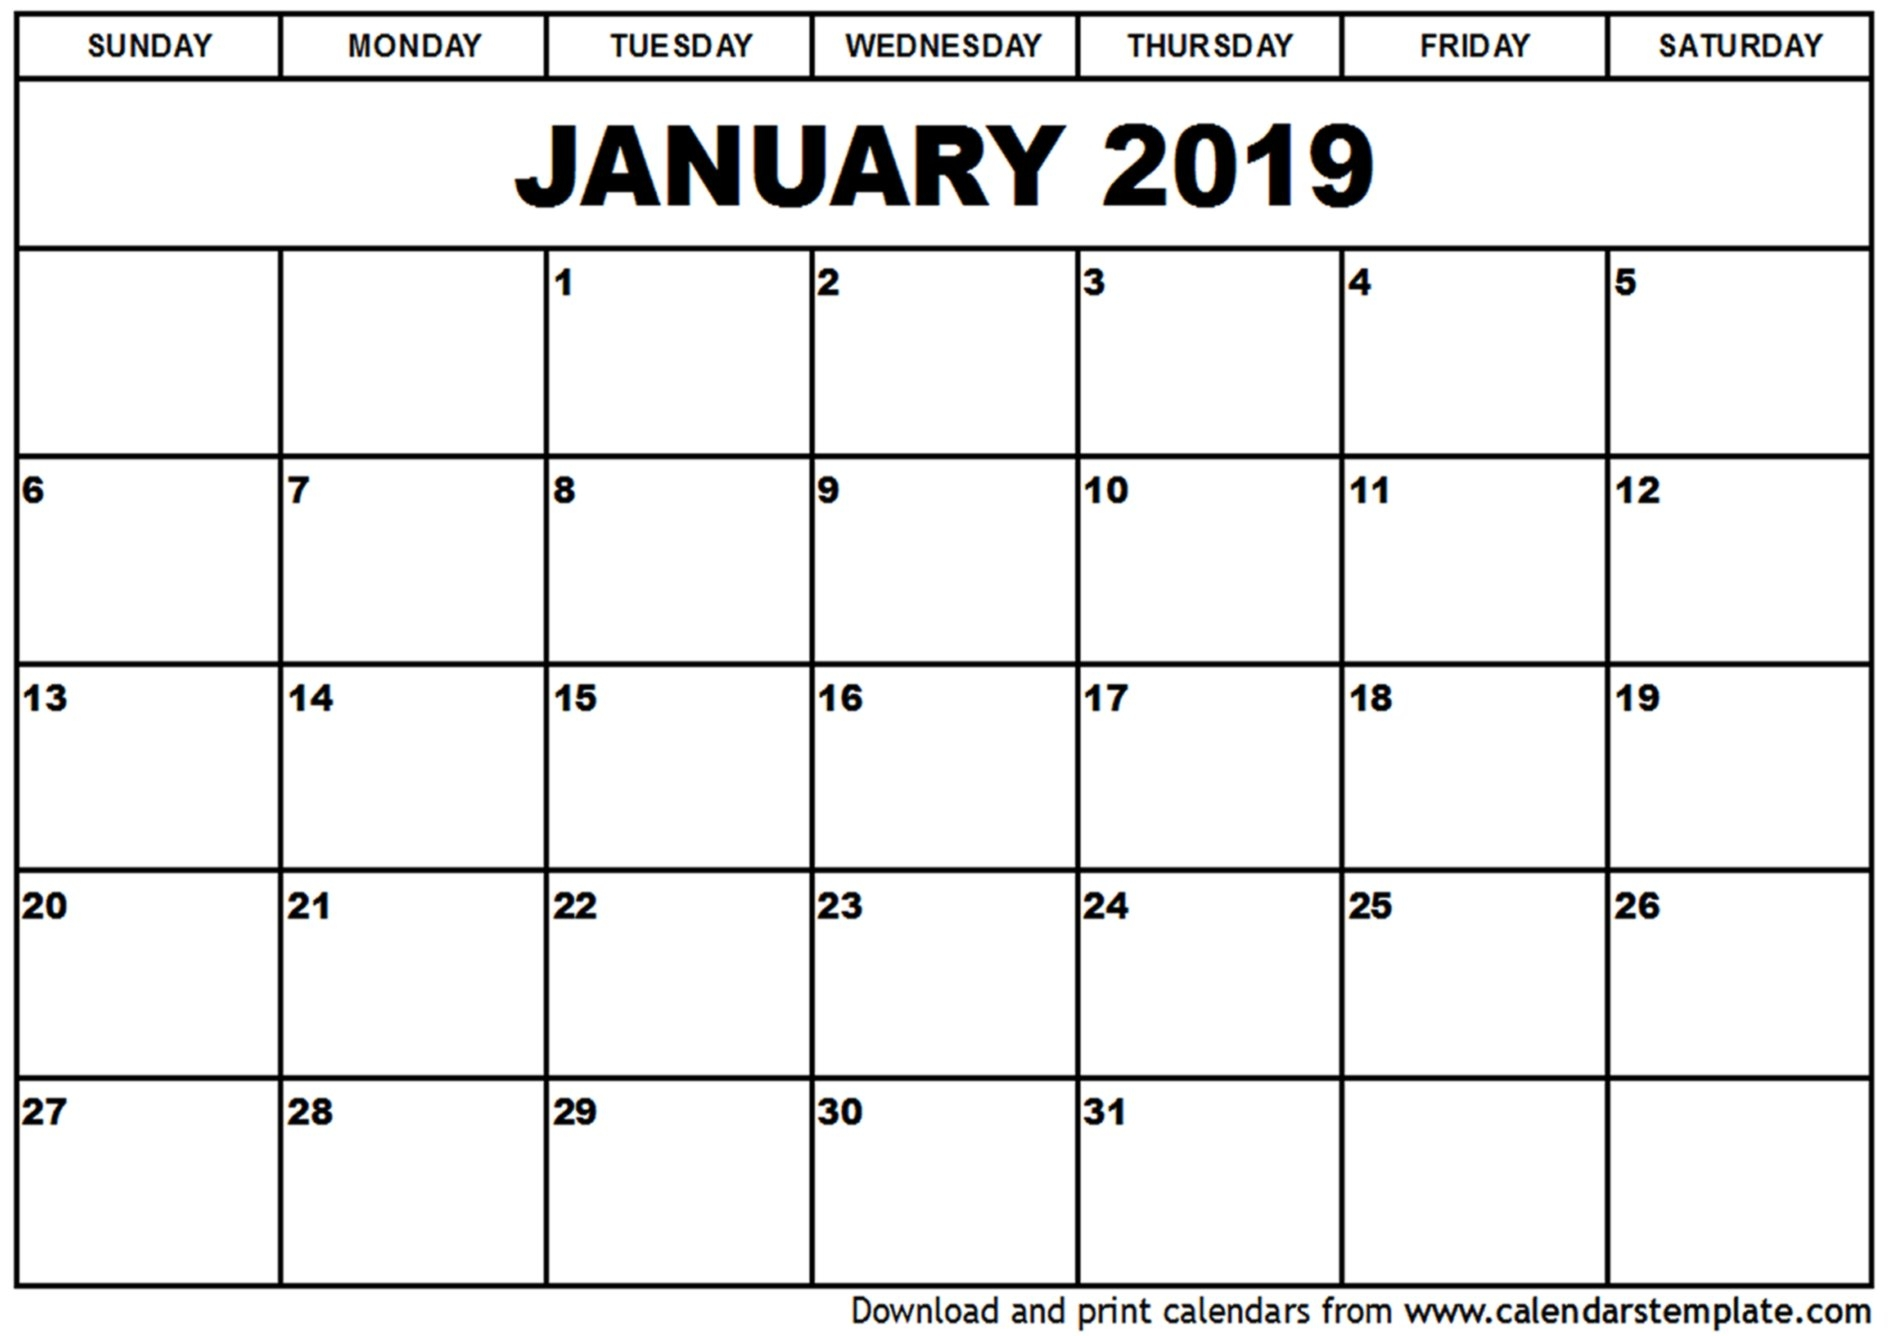 January 2019 Printable Calendar | 2018 Yearly Calendar Calendar 2019 Za Printanje